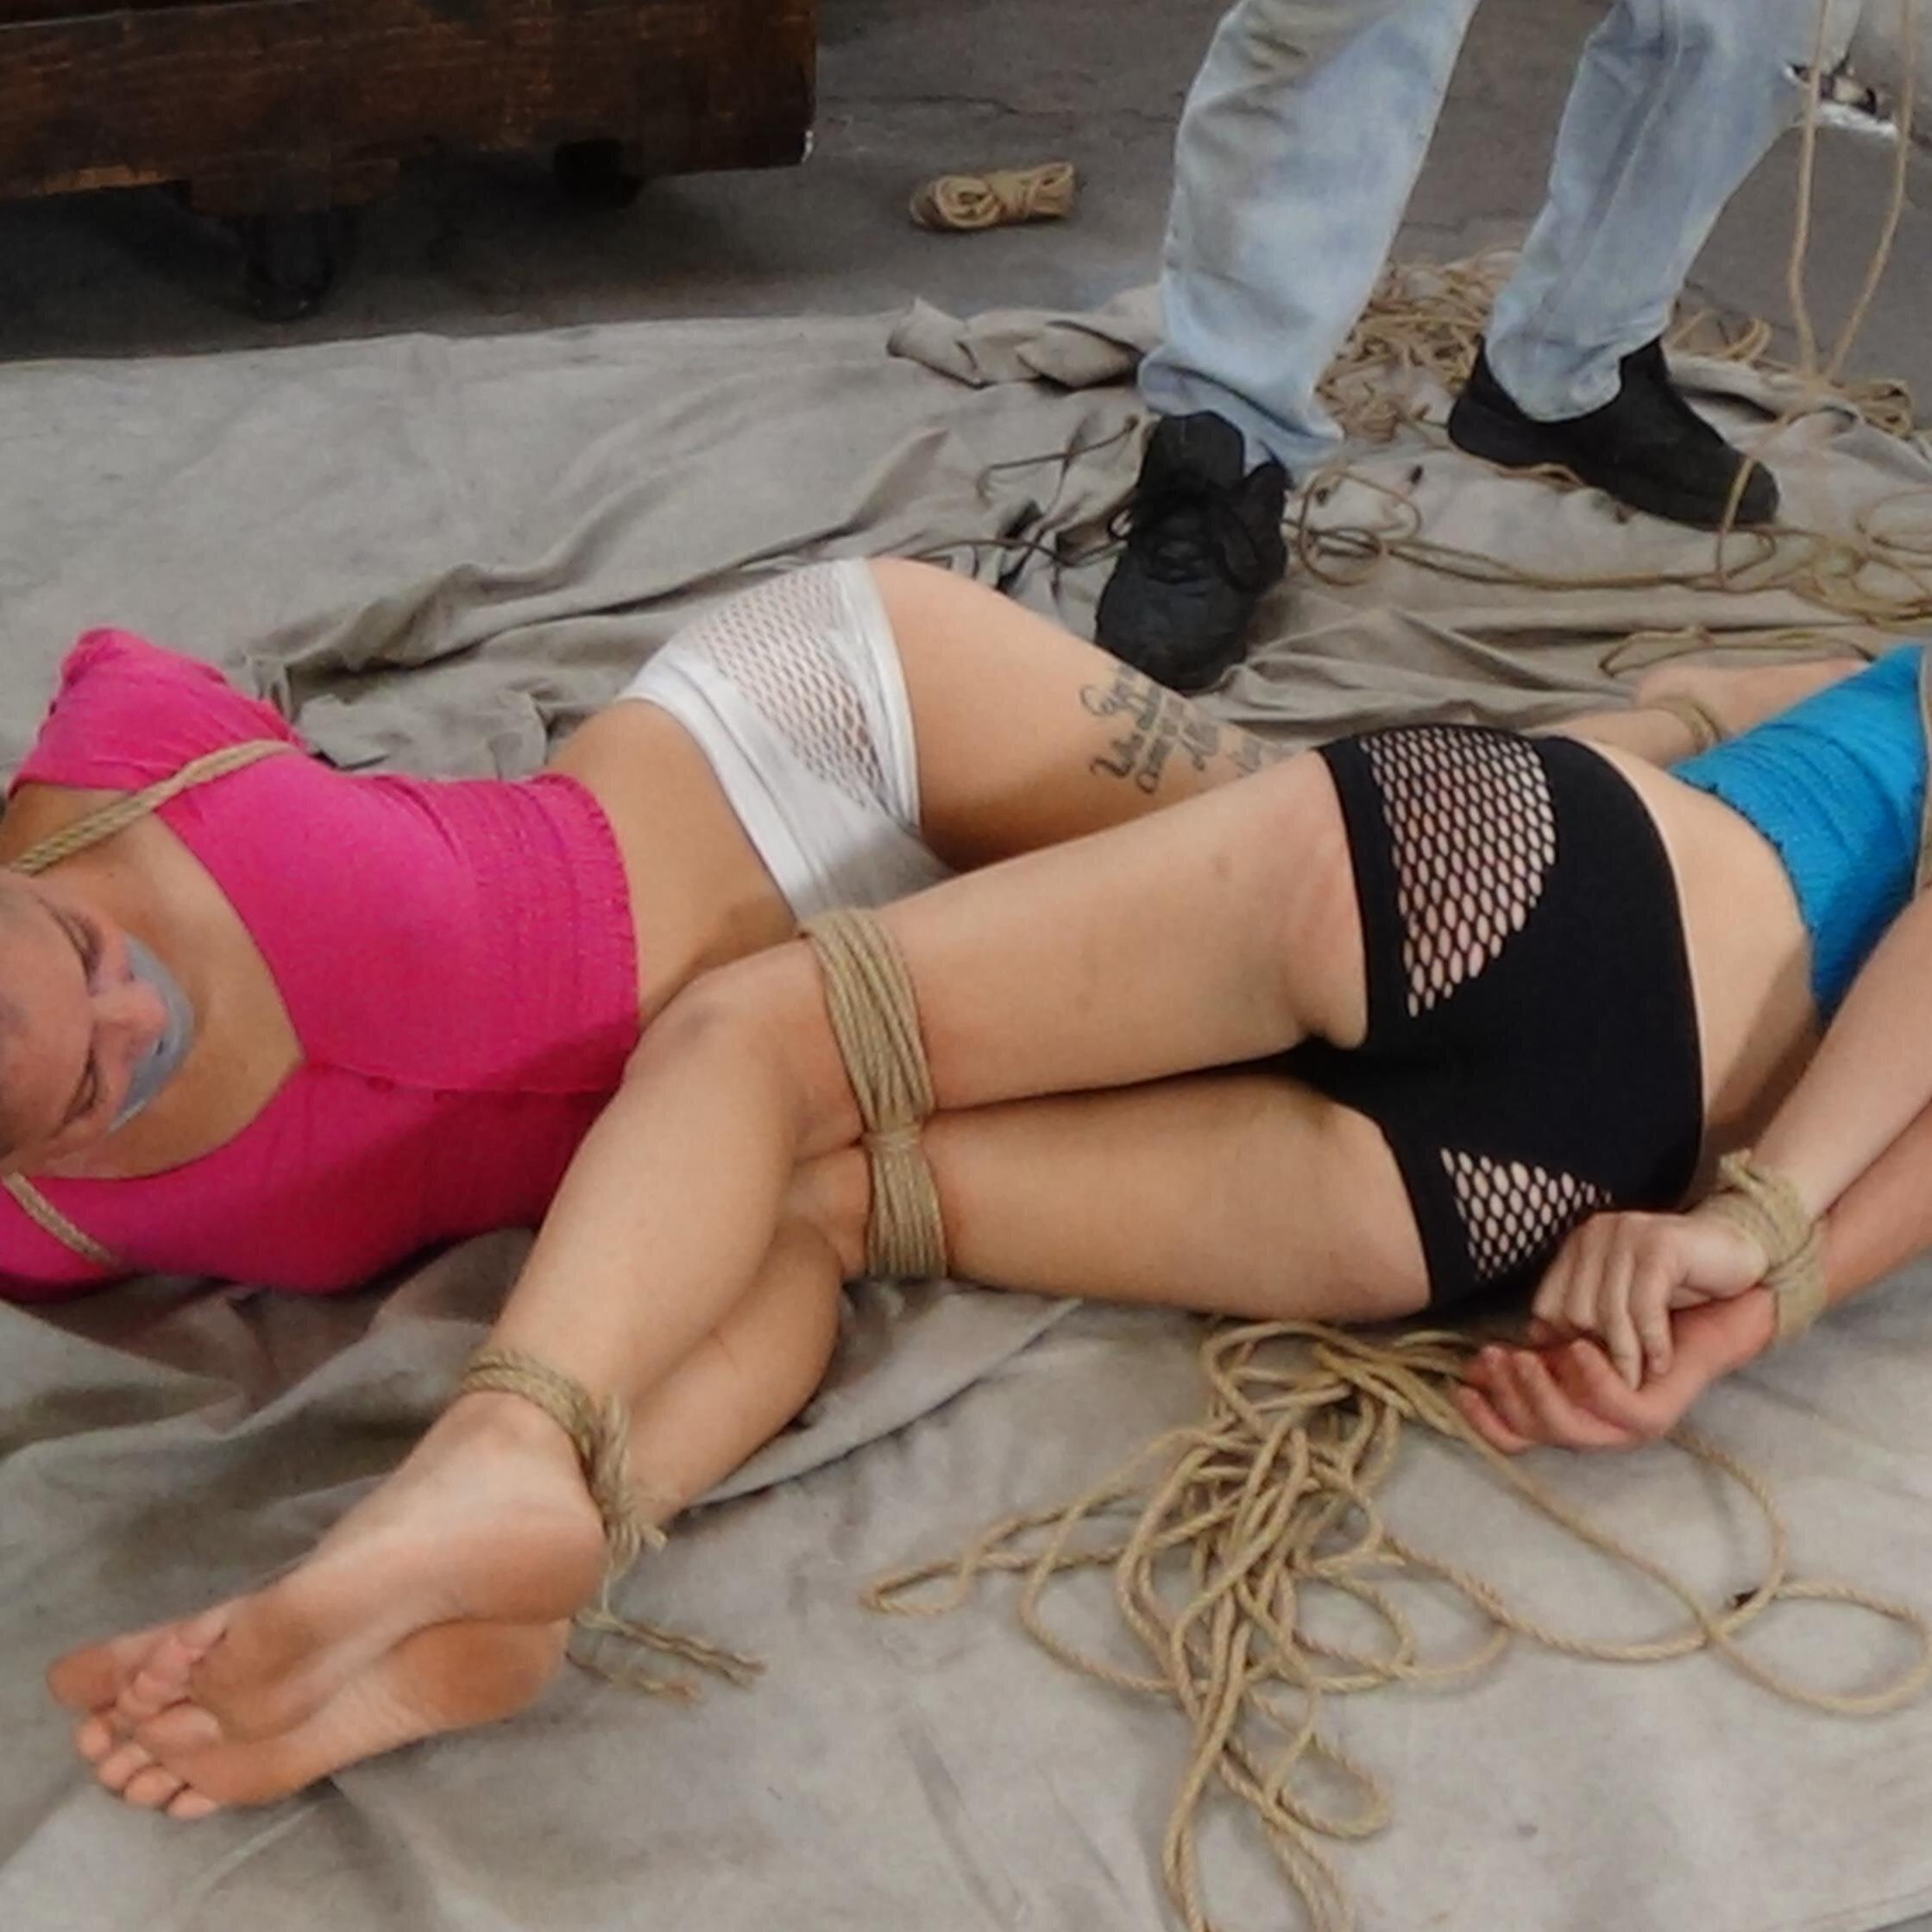 Laura cole lesbian maryland